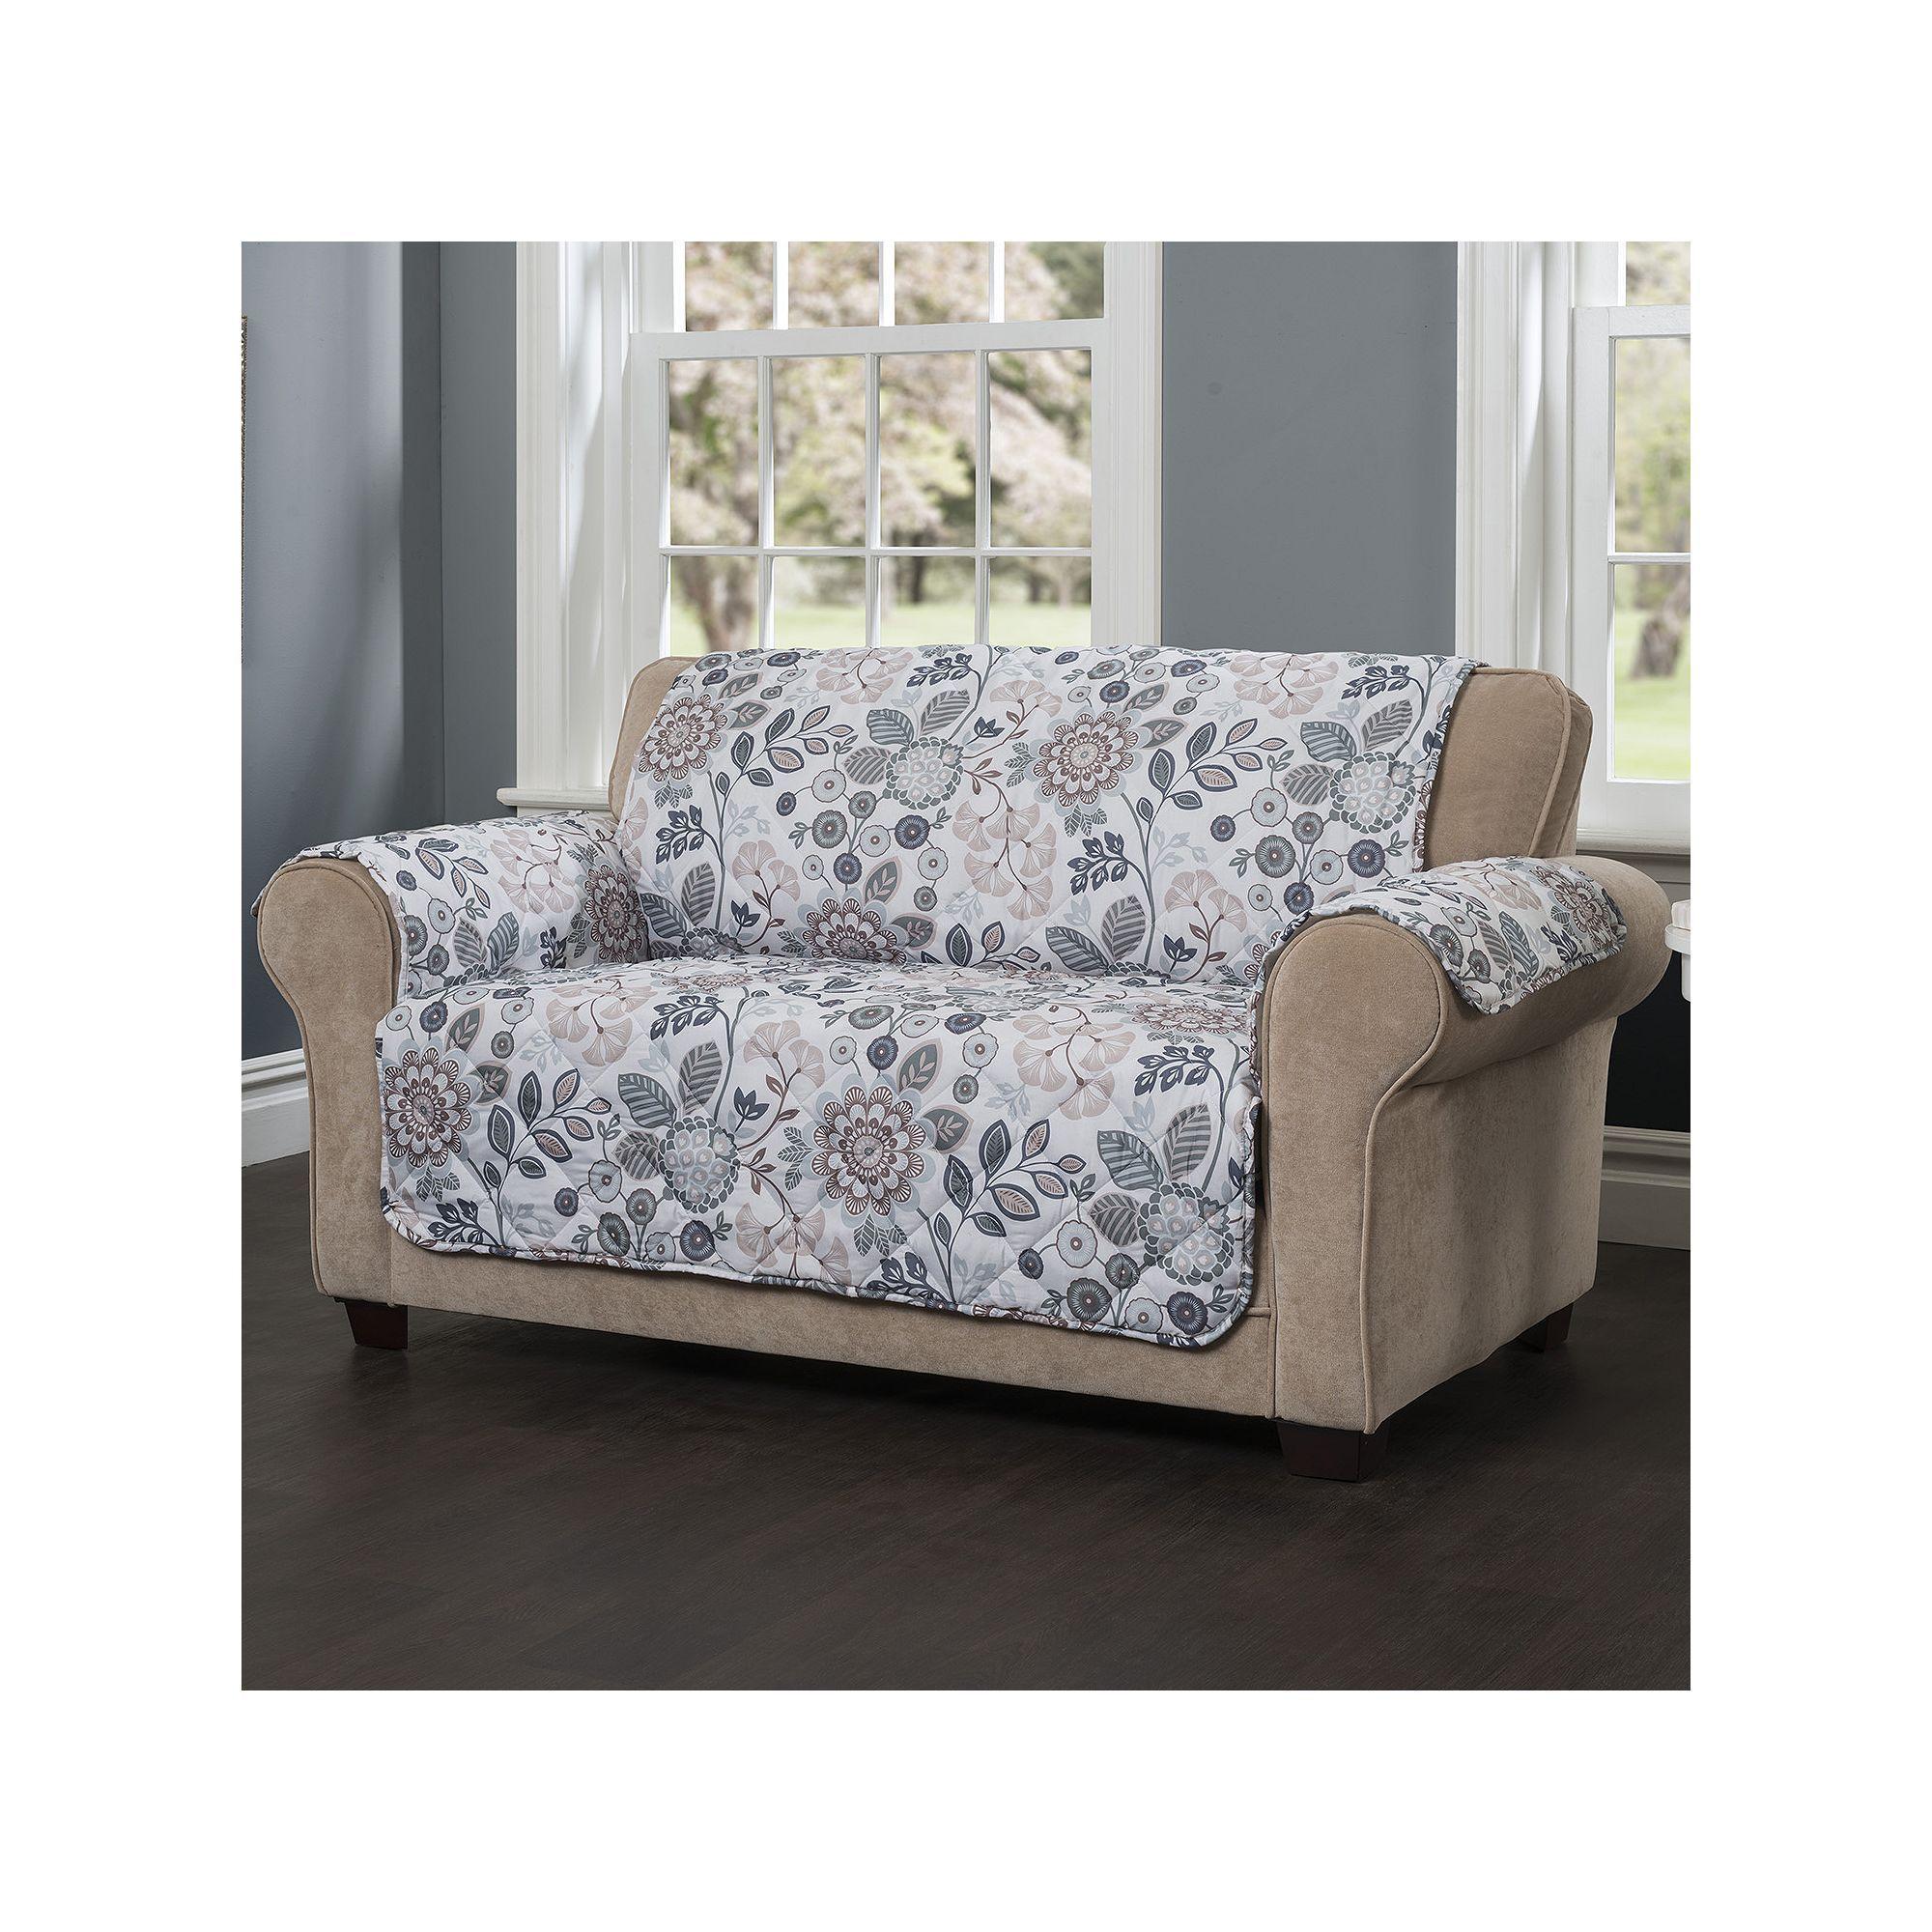 Amazing Jeffrey Home Palladio Loveseat Slipcover Slipcovers For Inzonedesignstudio Interior Chair Design Inzonedesignstudiocom